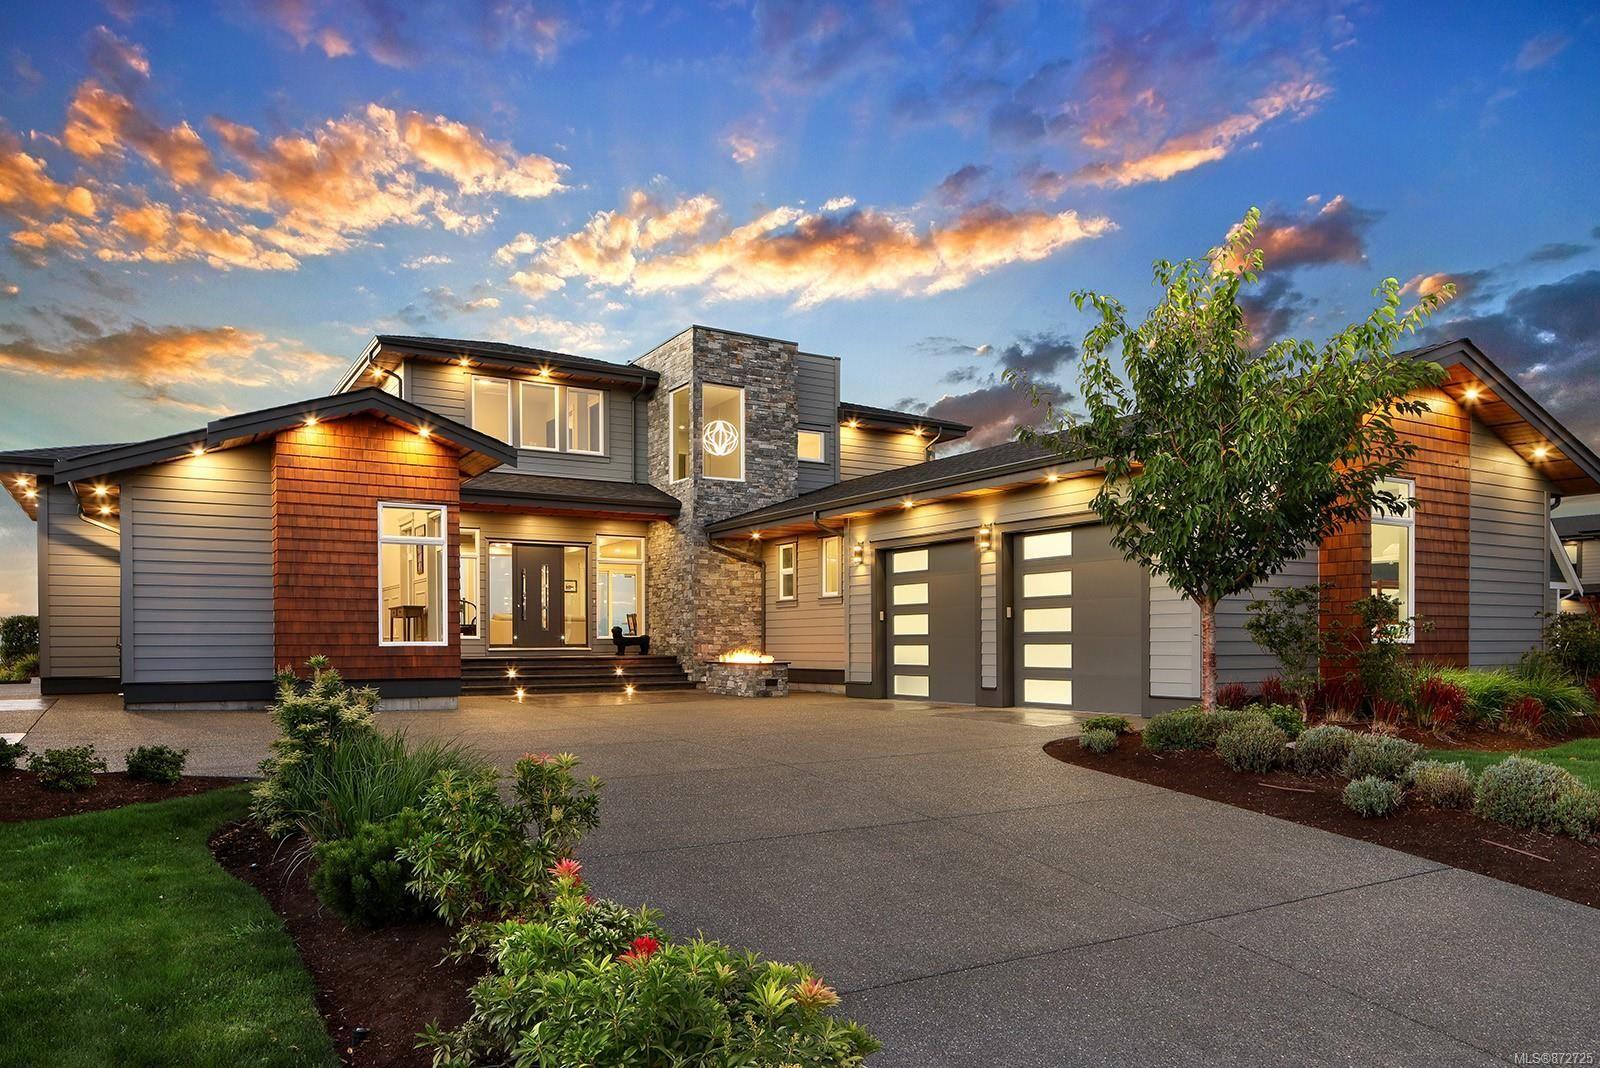 Main Photo: 10 1310 Wilkinson Rd in : CV Comox Peninsula House for sale (Comox Valley)  : MLS®# 872725